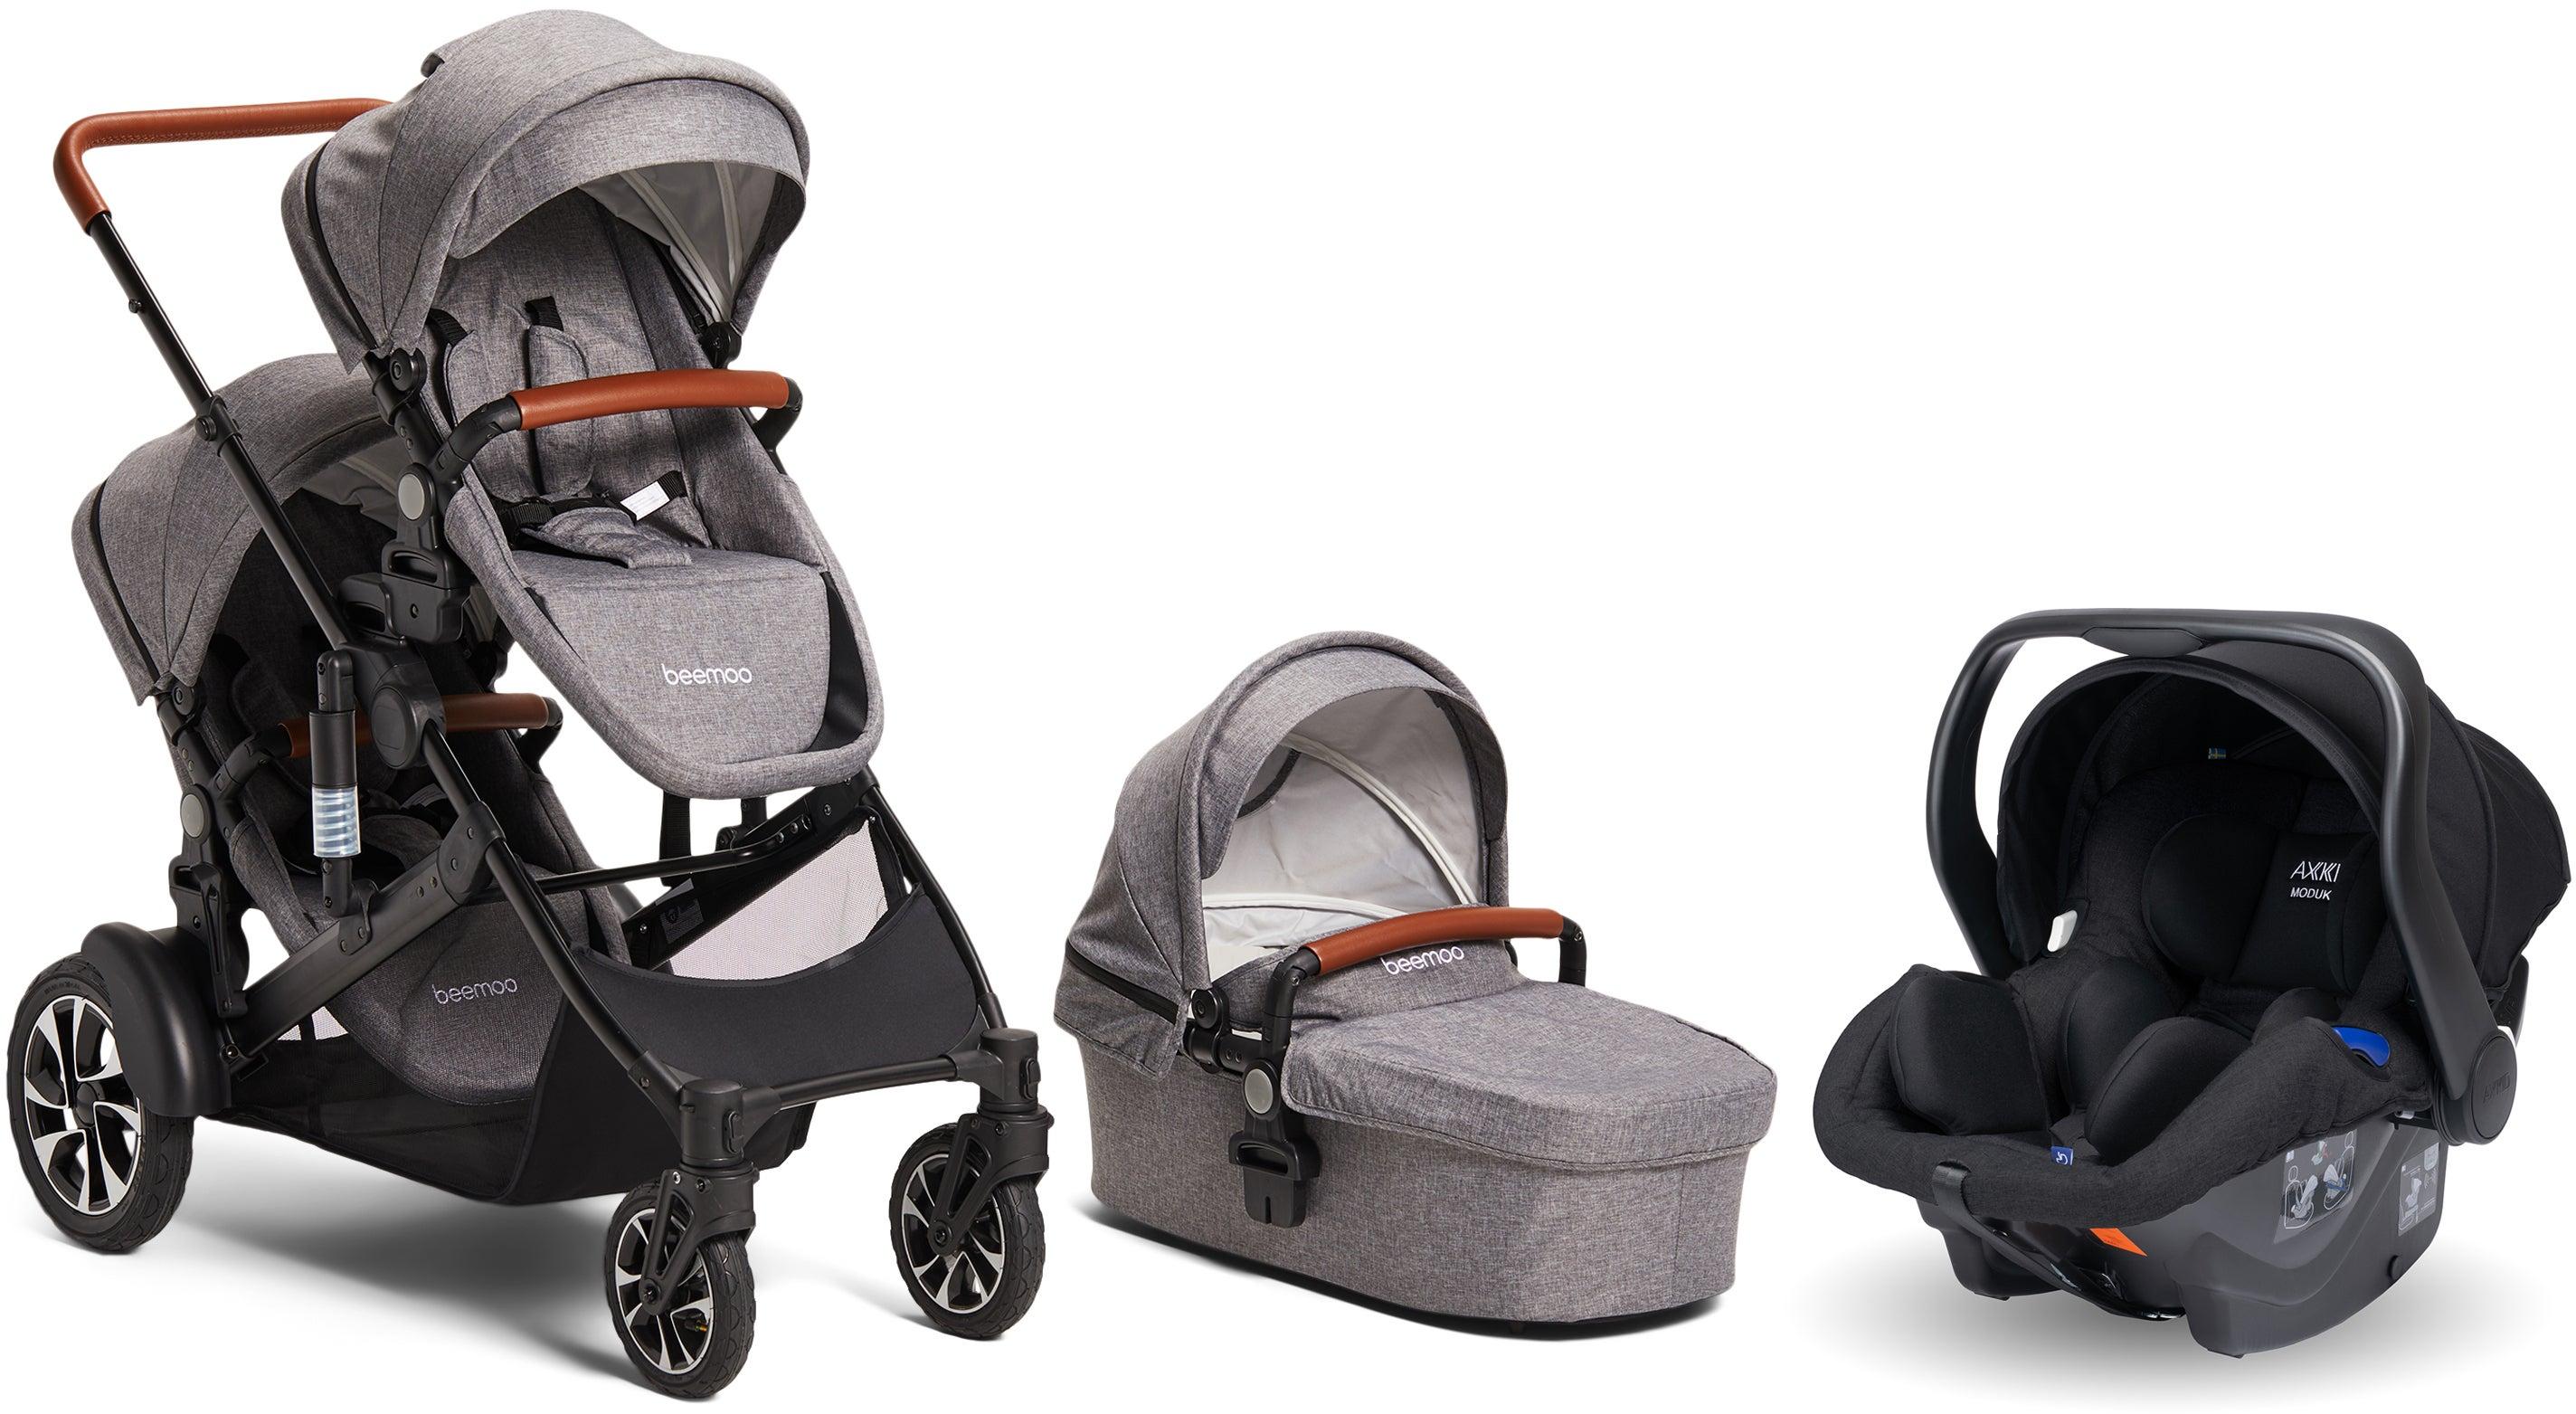 Beemoo Maxi 4 Twin Sisält. Modukid Infant Turvakaukalo, Grey/Black